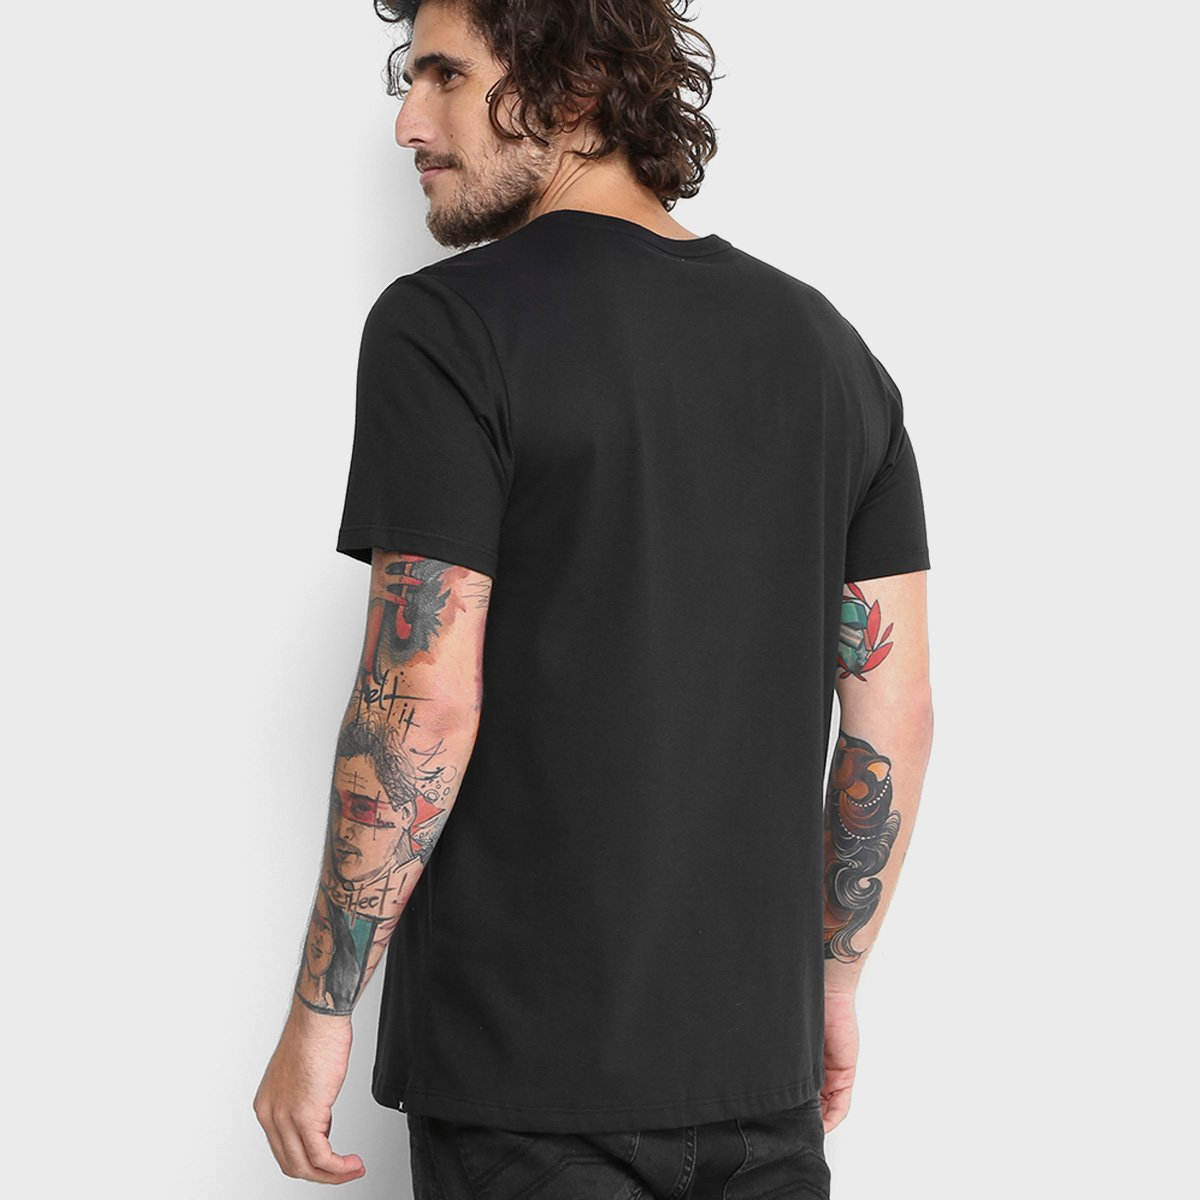 Camiseta Hurley Silk Color Cmyk Masculina - Compre Agora  2720f6ed0e34c